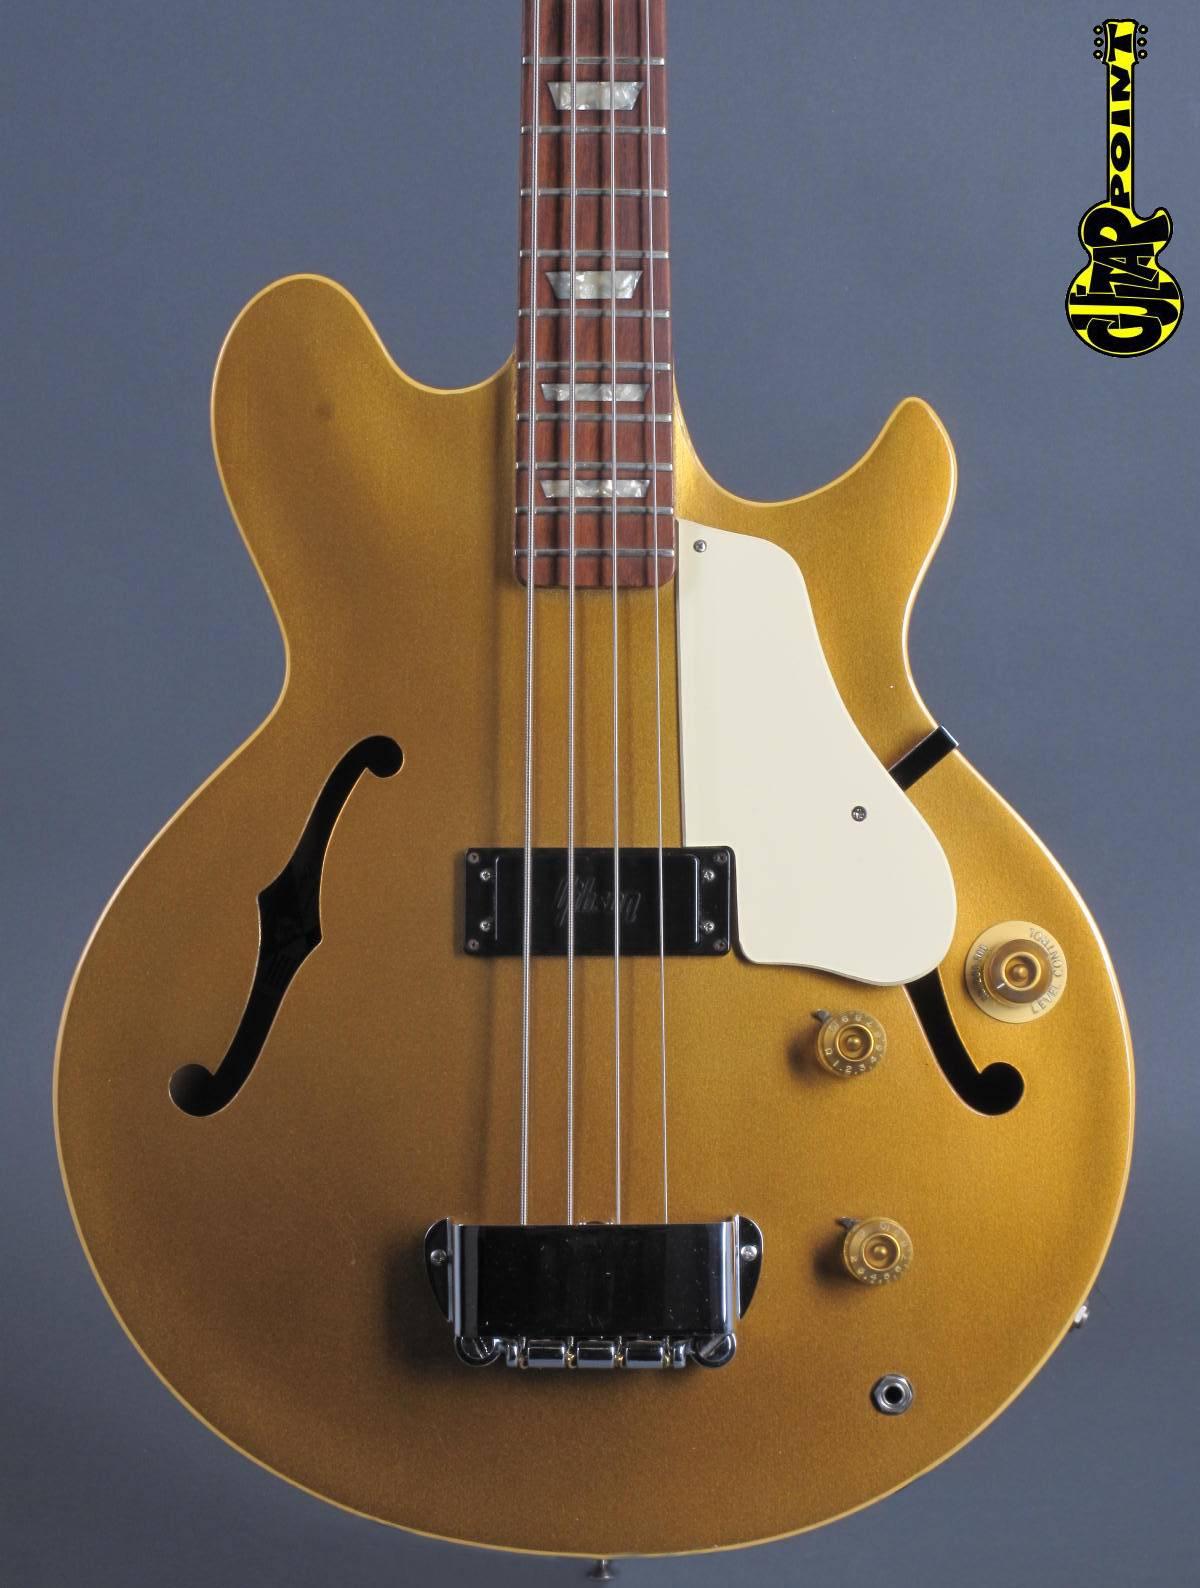 1974 Gibson Les Paul Signature Bass - Goldmetallic